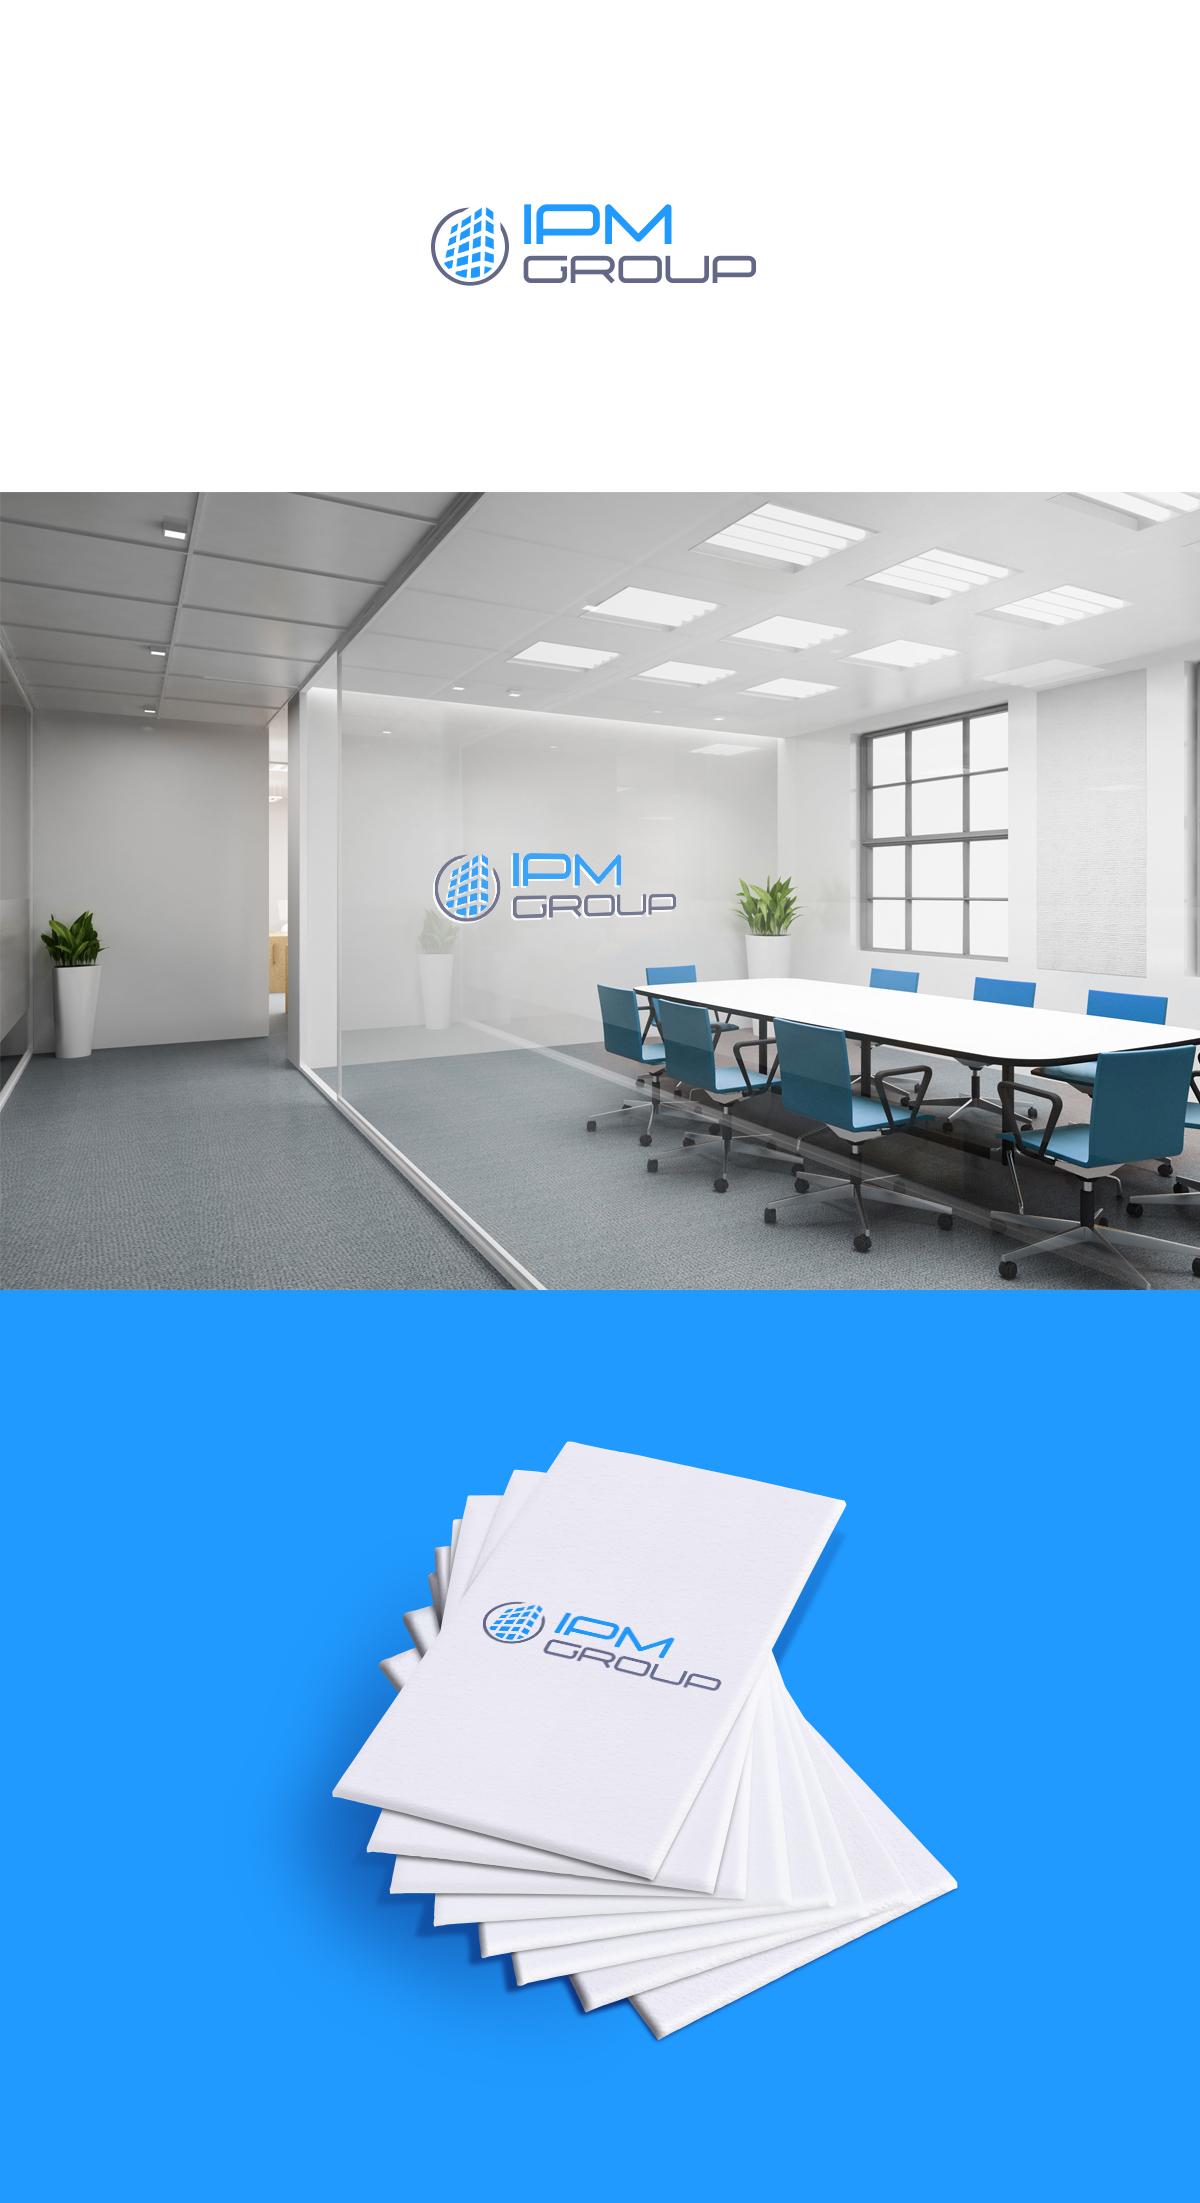 Разработка логотипа для управляющей компании фото f_0675f837c37a26ef.jpg